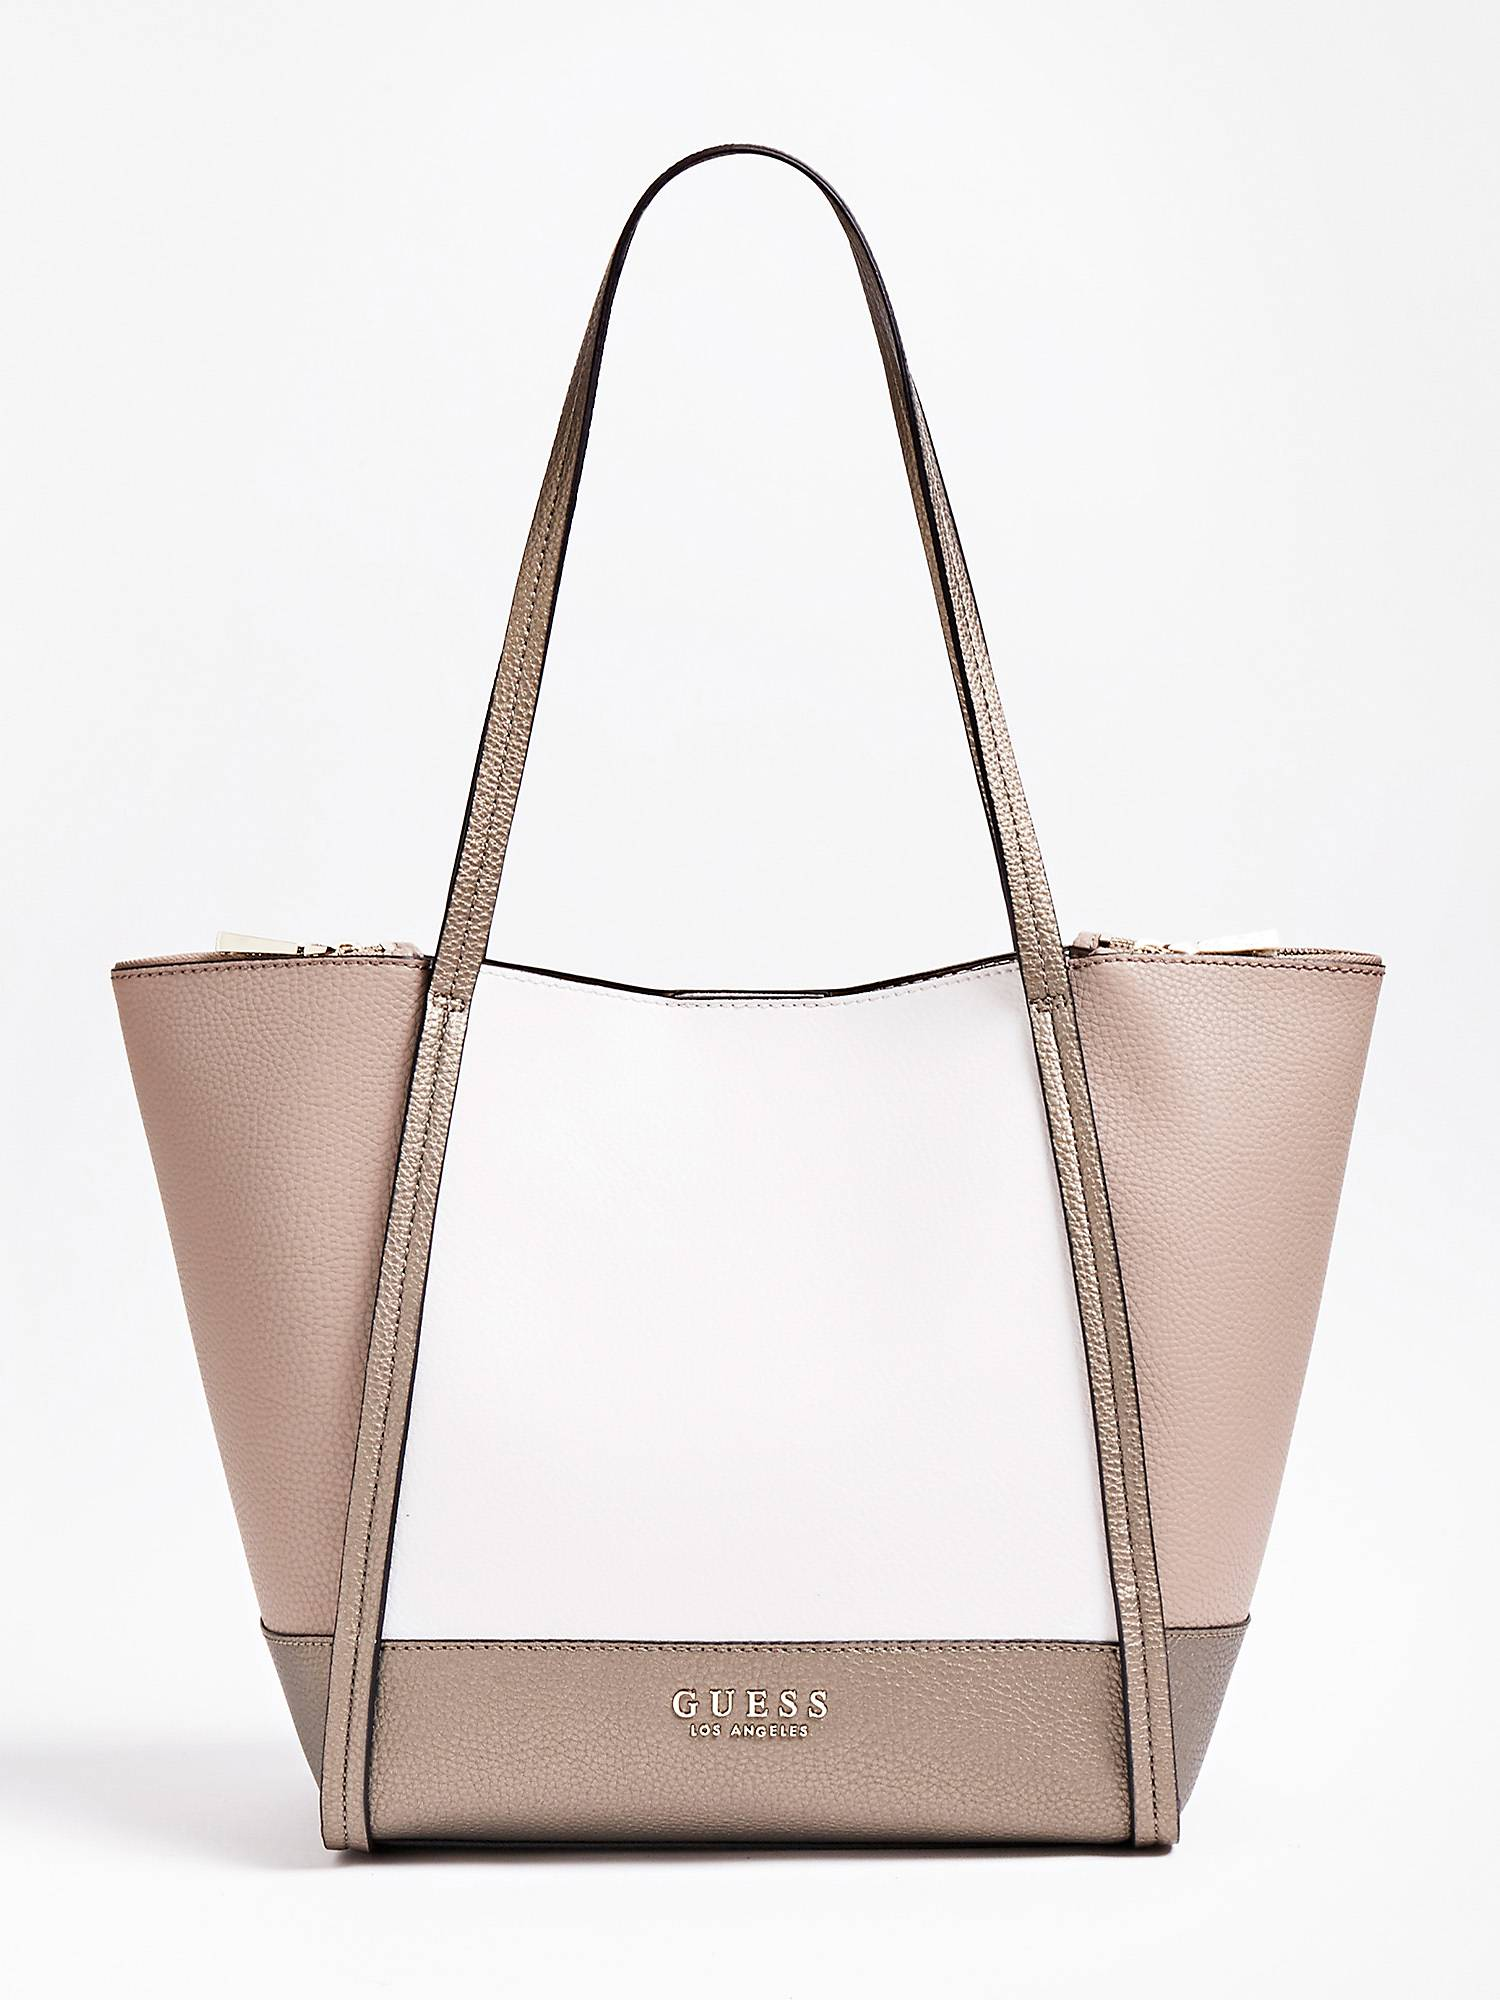 Shopping bag Guess mod Heidi estate 2019 prezzo 135 euro